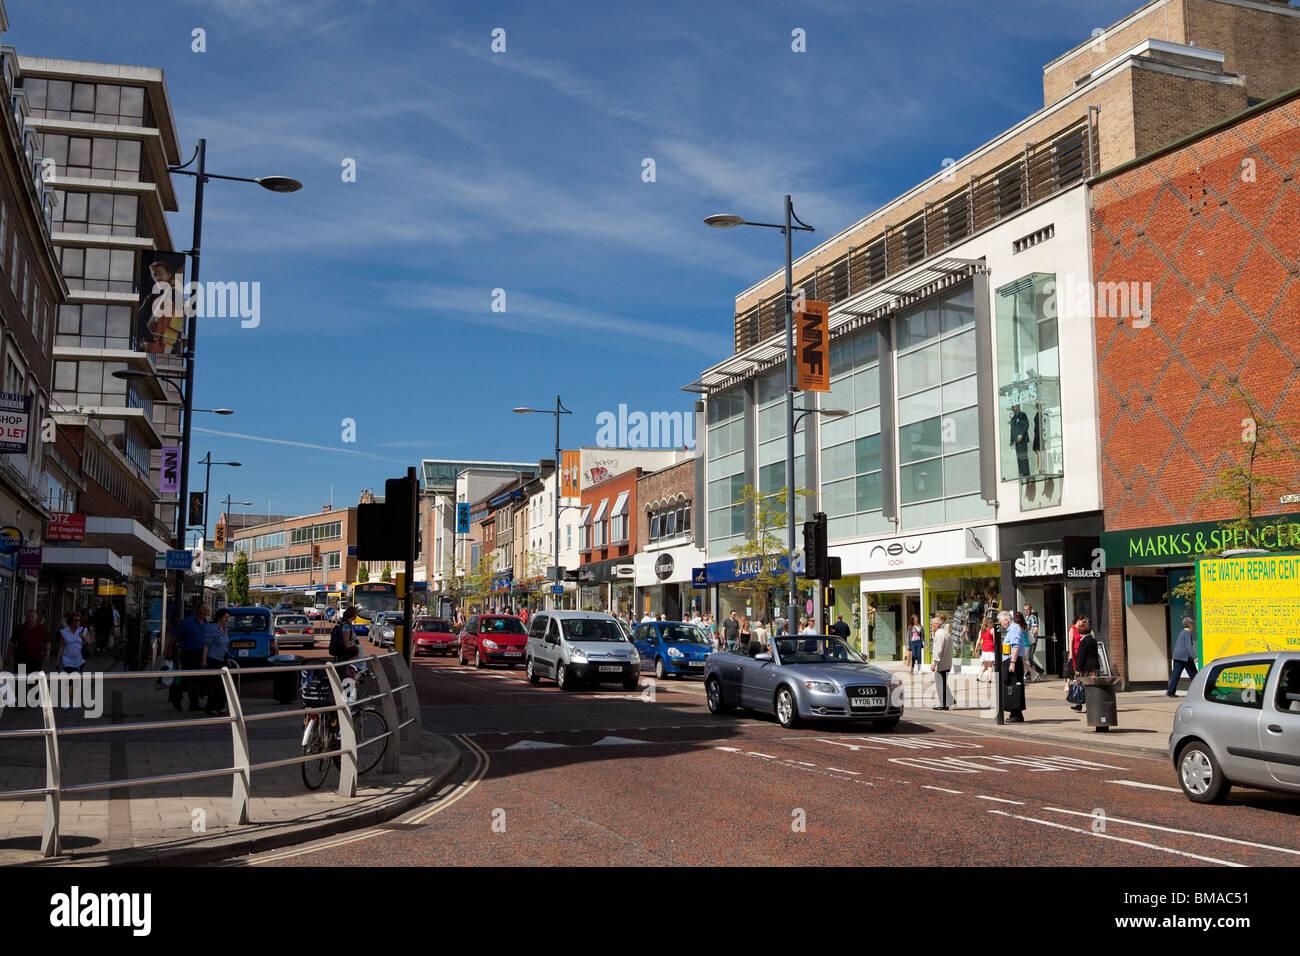 Norwich city centre, St Stephens street. - Stock Image